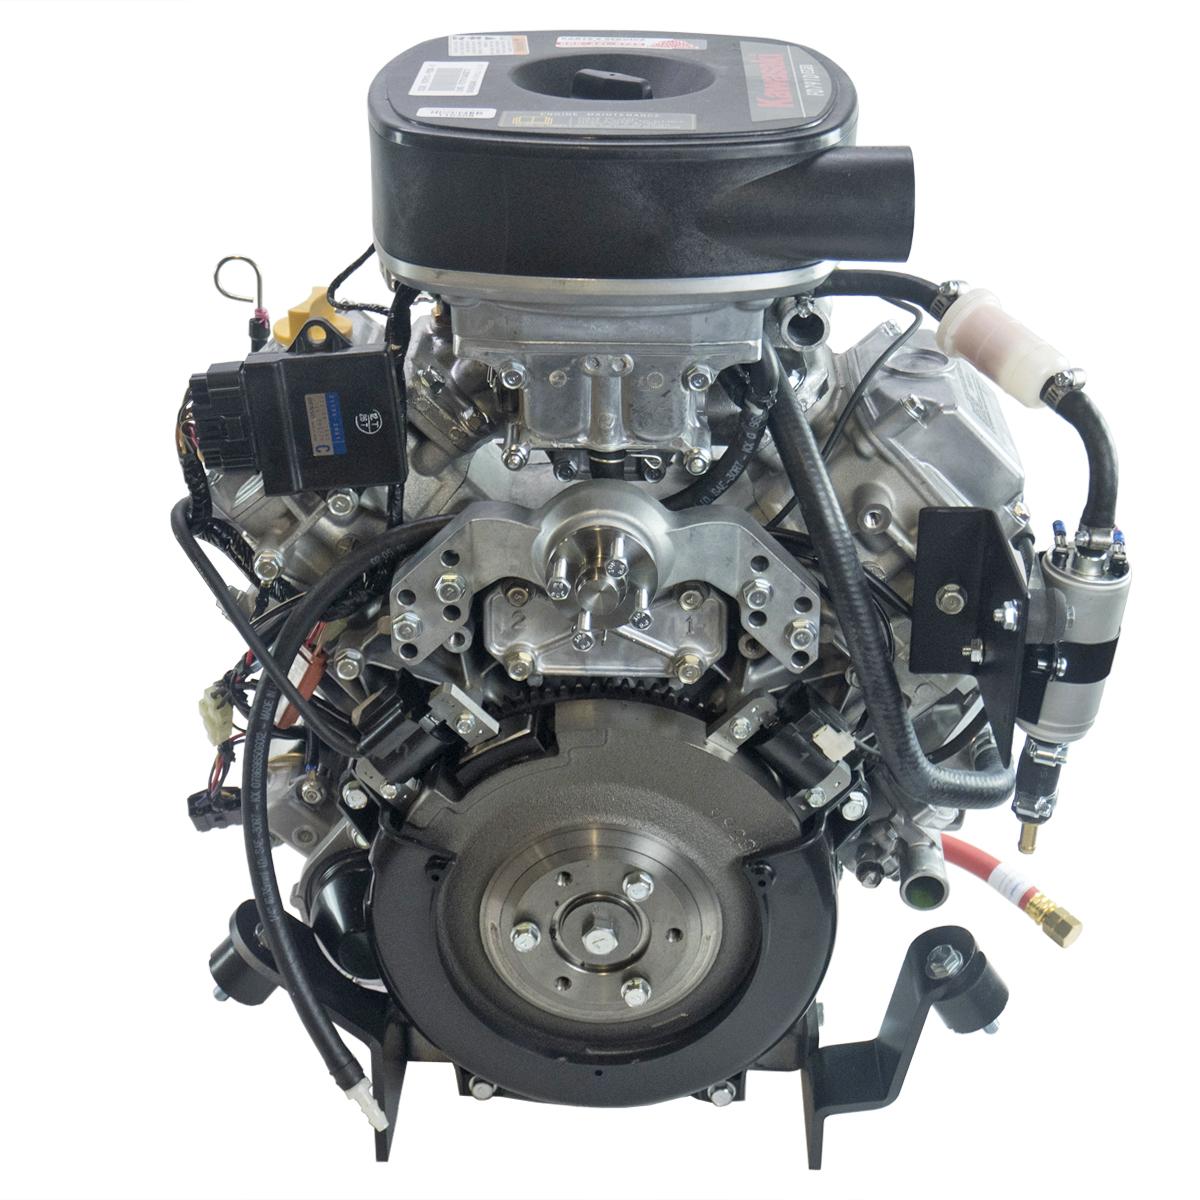 John Deere 445 Fuel Pump Diagram